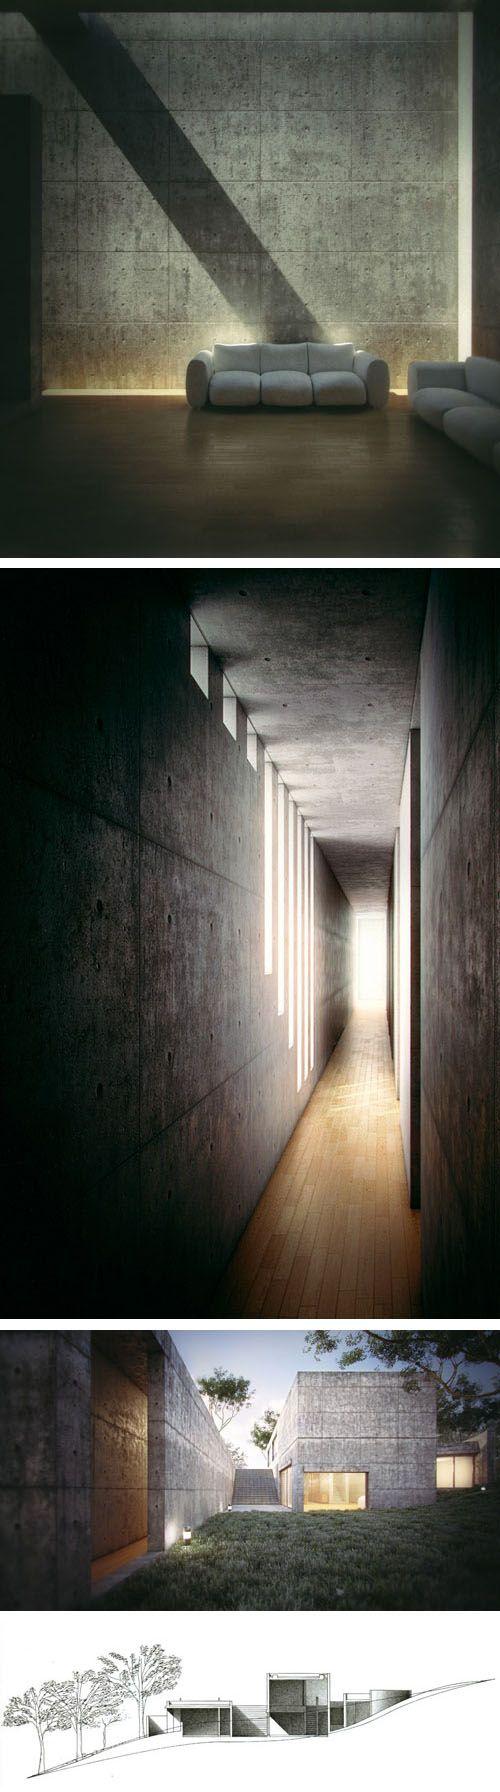 Koshino House by Tadao Ando